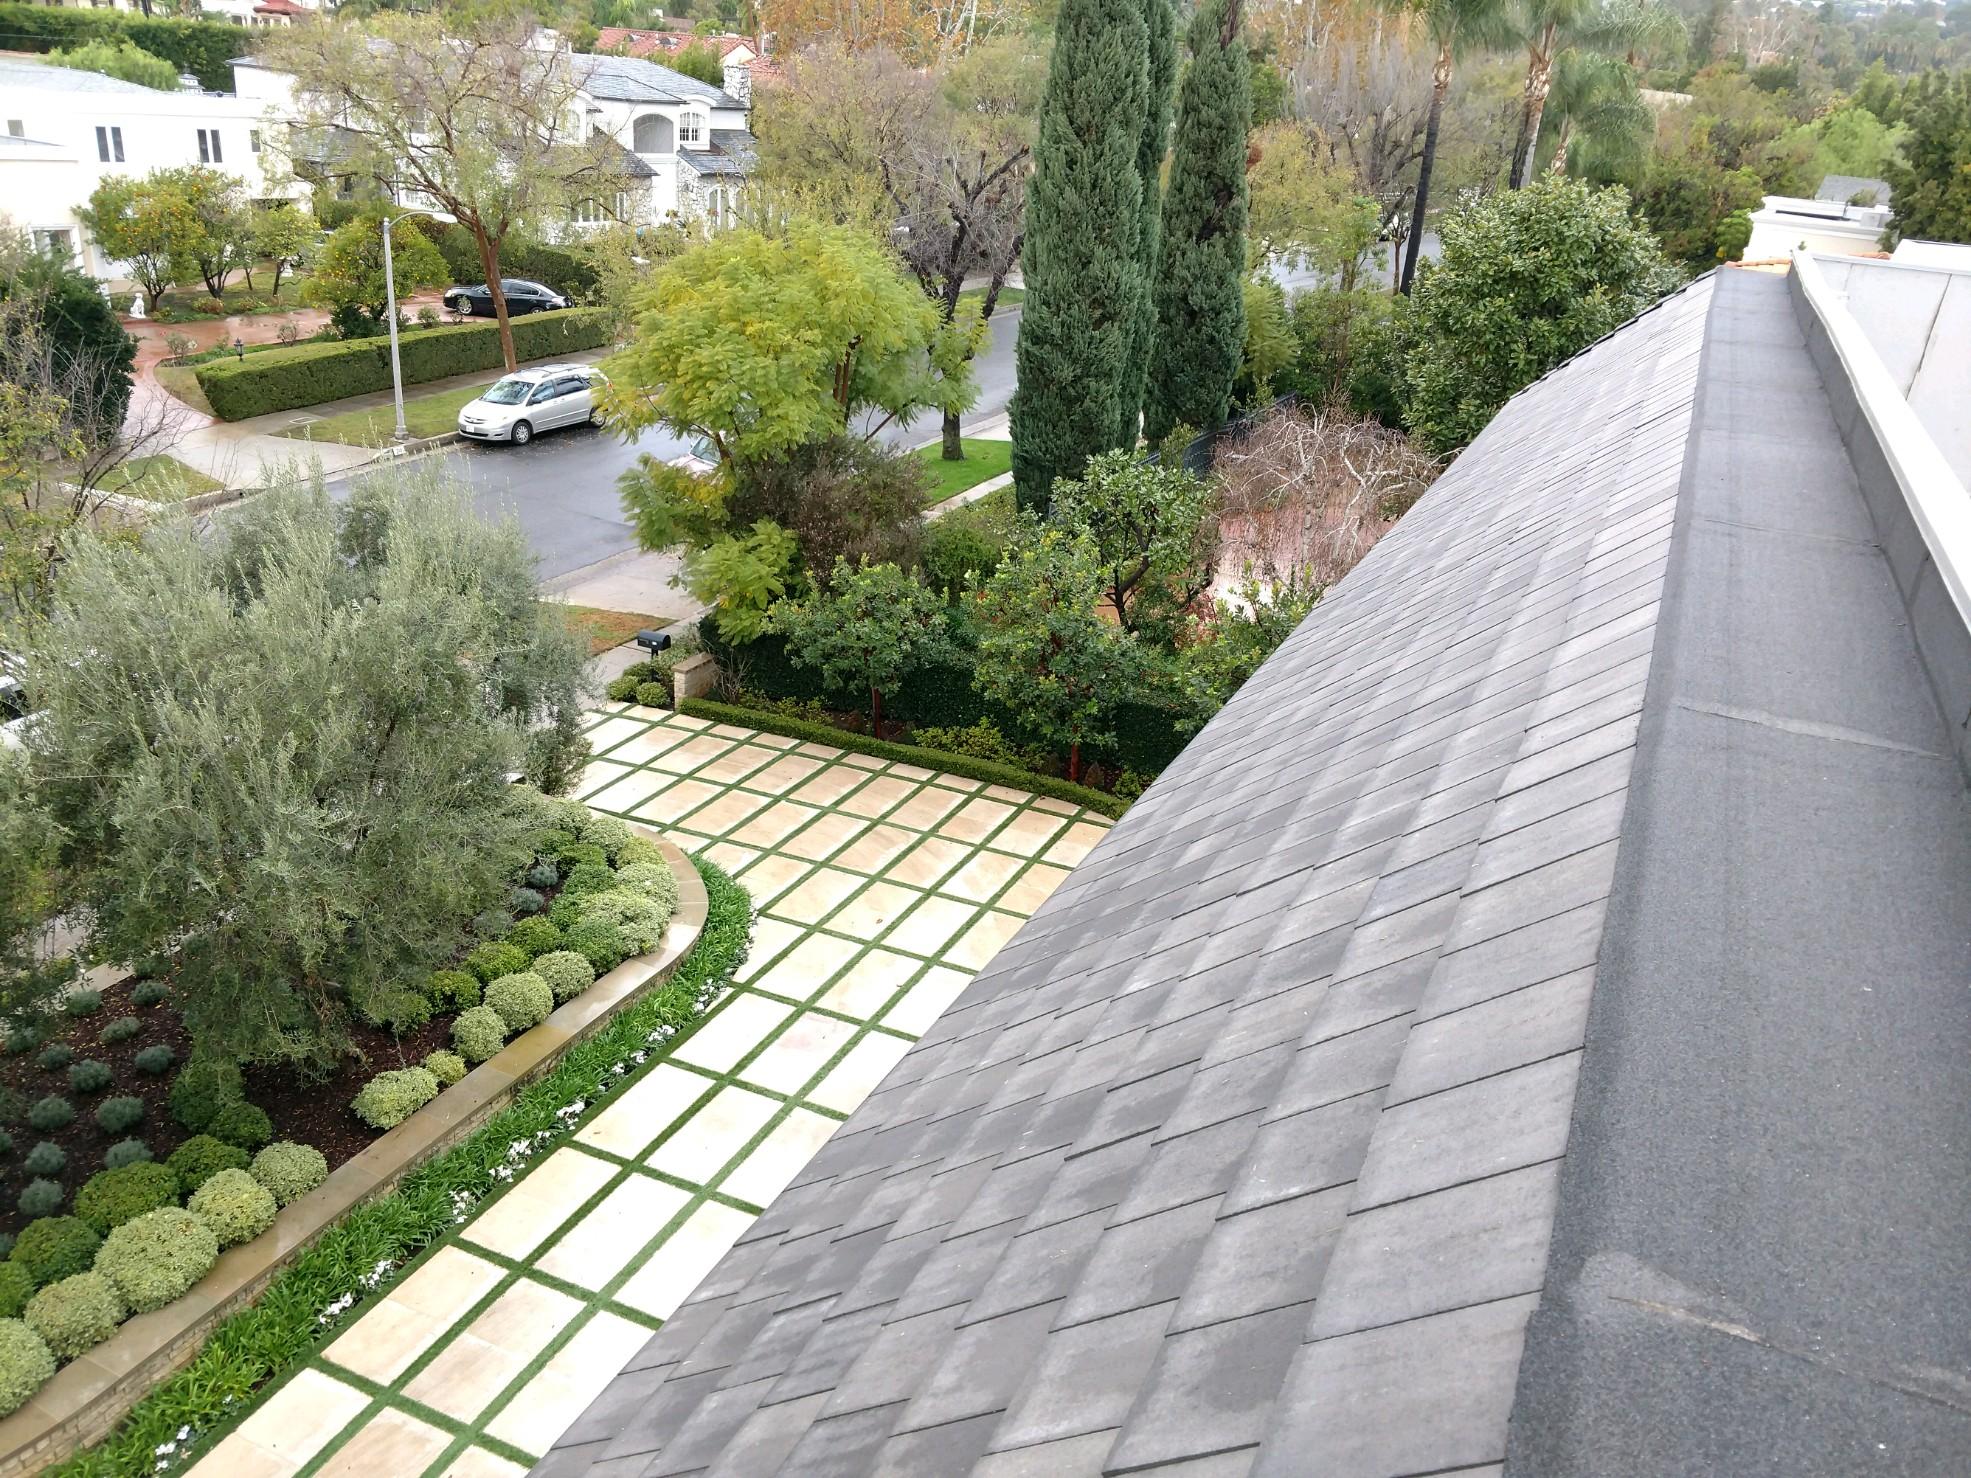 Original Slate Tile